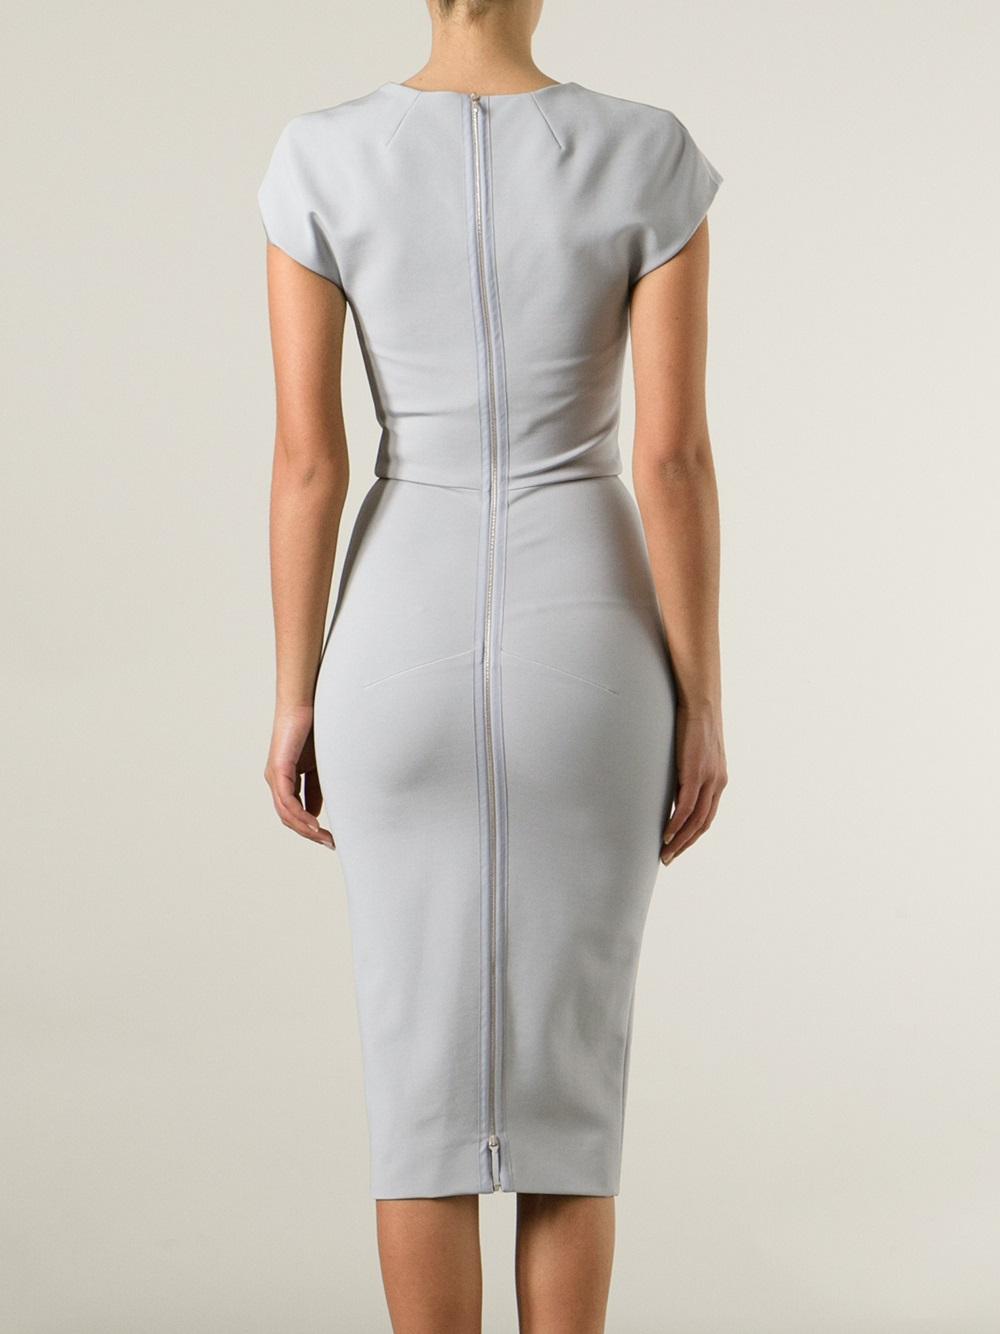 Victoria Beckham Grey Dresses